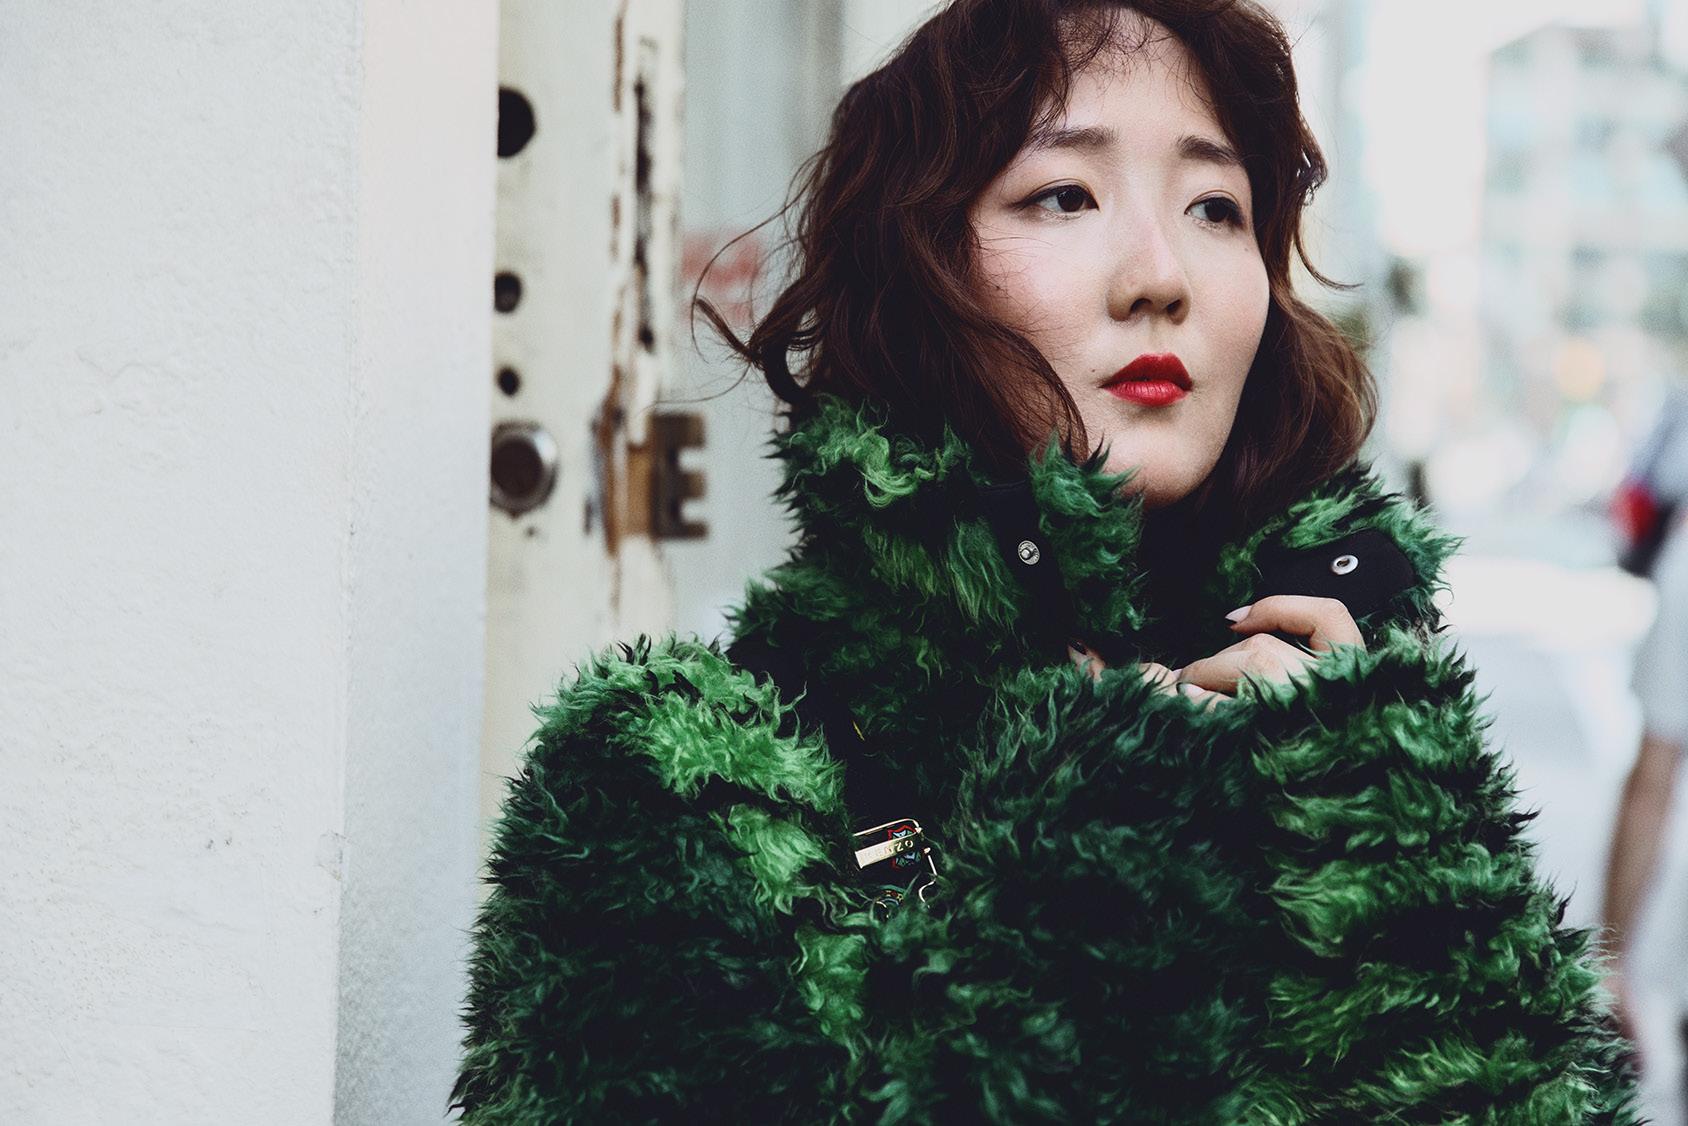 Shini Park wearing H&M x Kenzo jacket